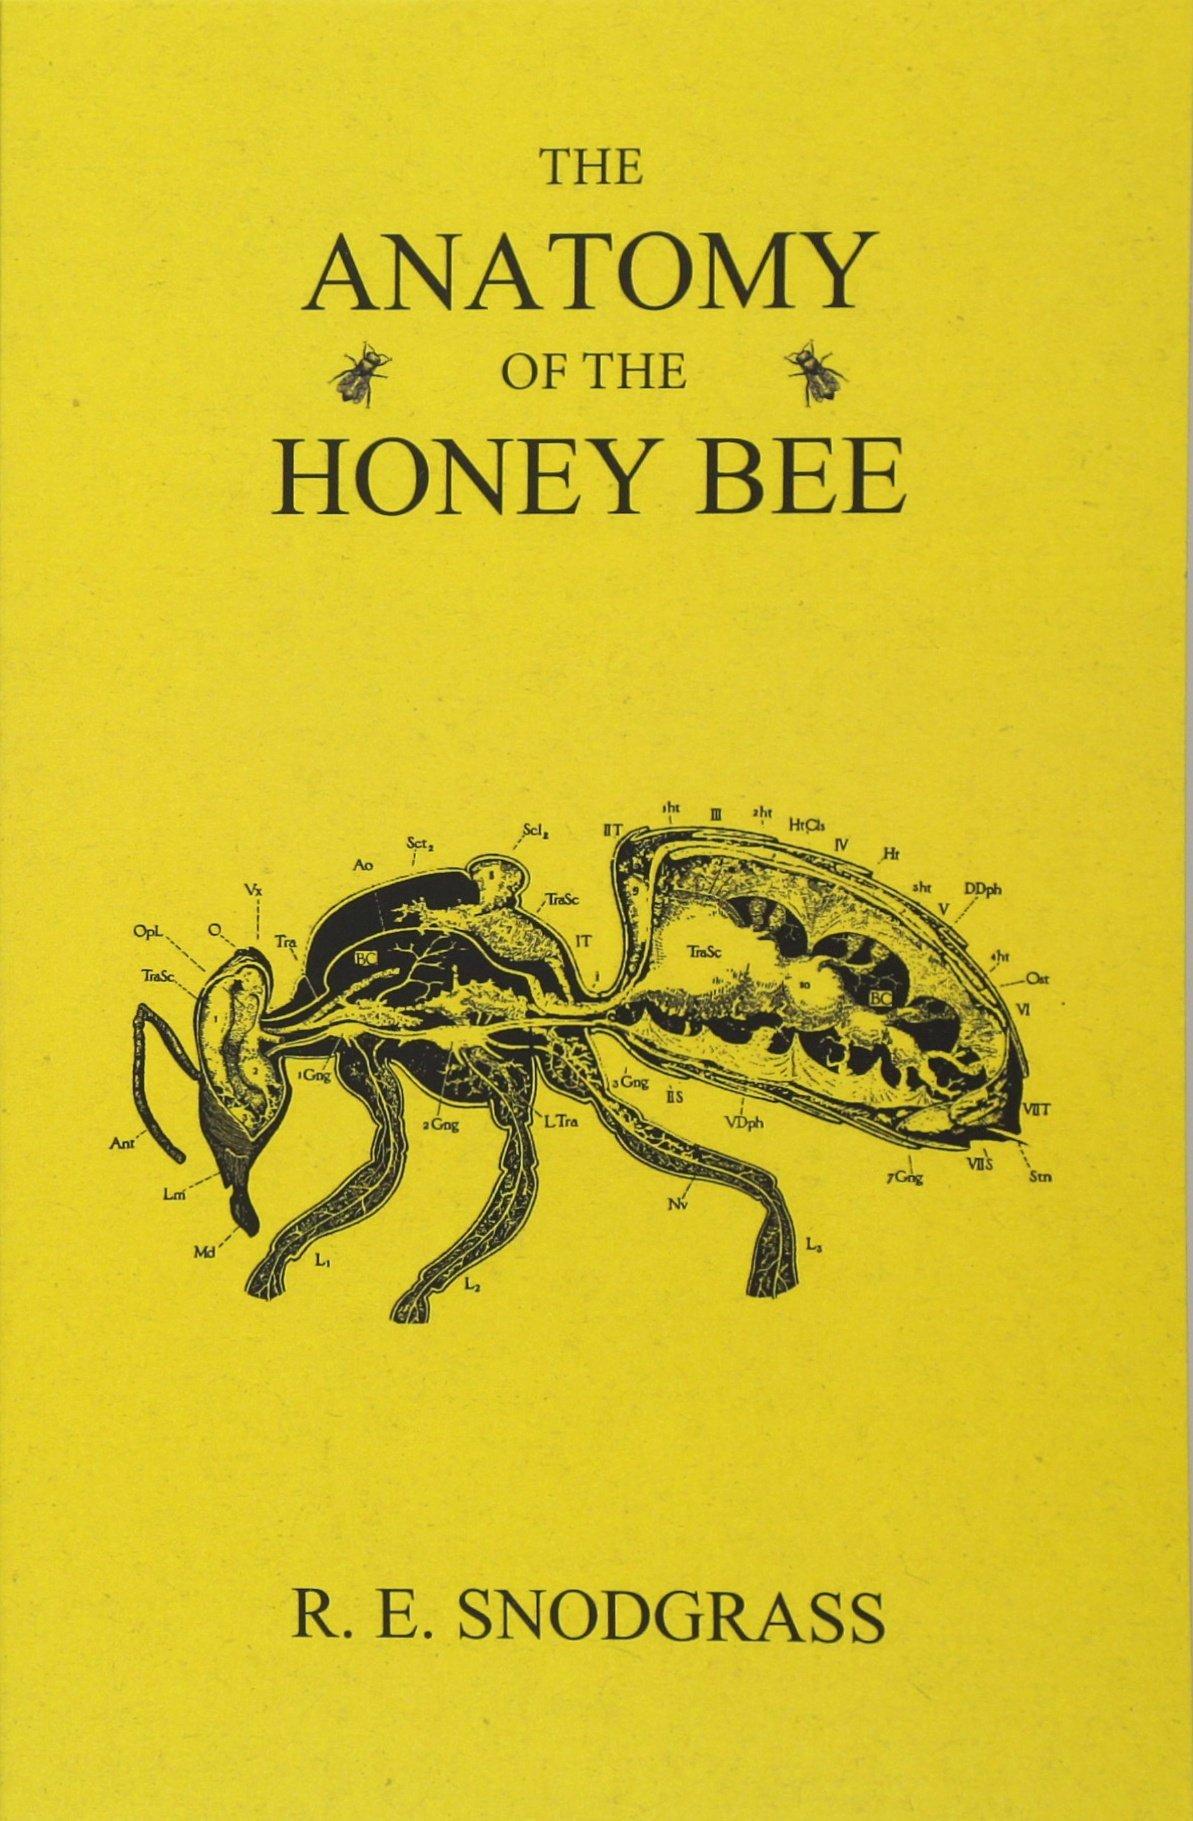 The Anatomy of the Honey Bee: Amazon.co.uk: R. E. Snodgrass ...